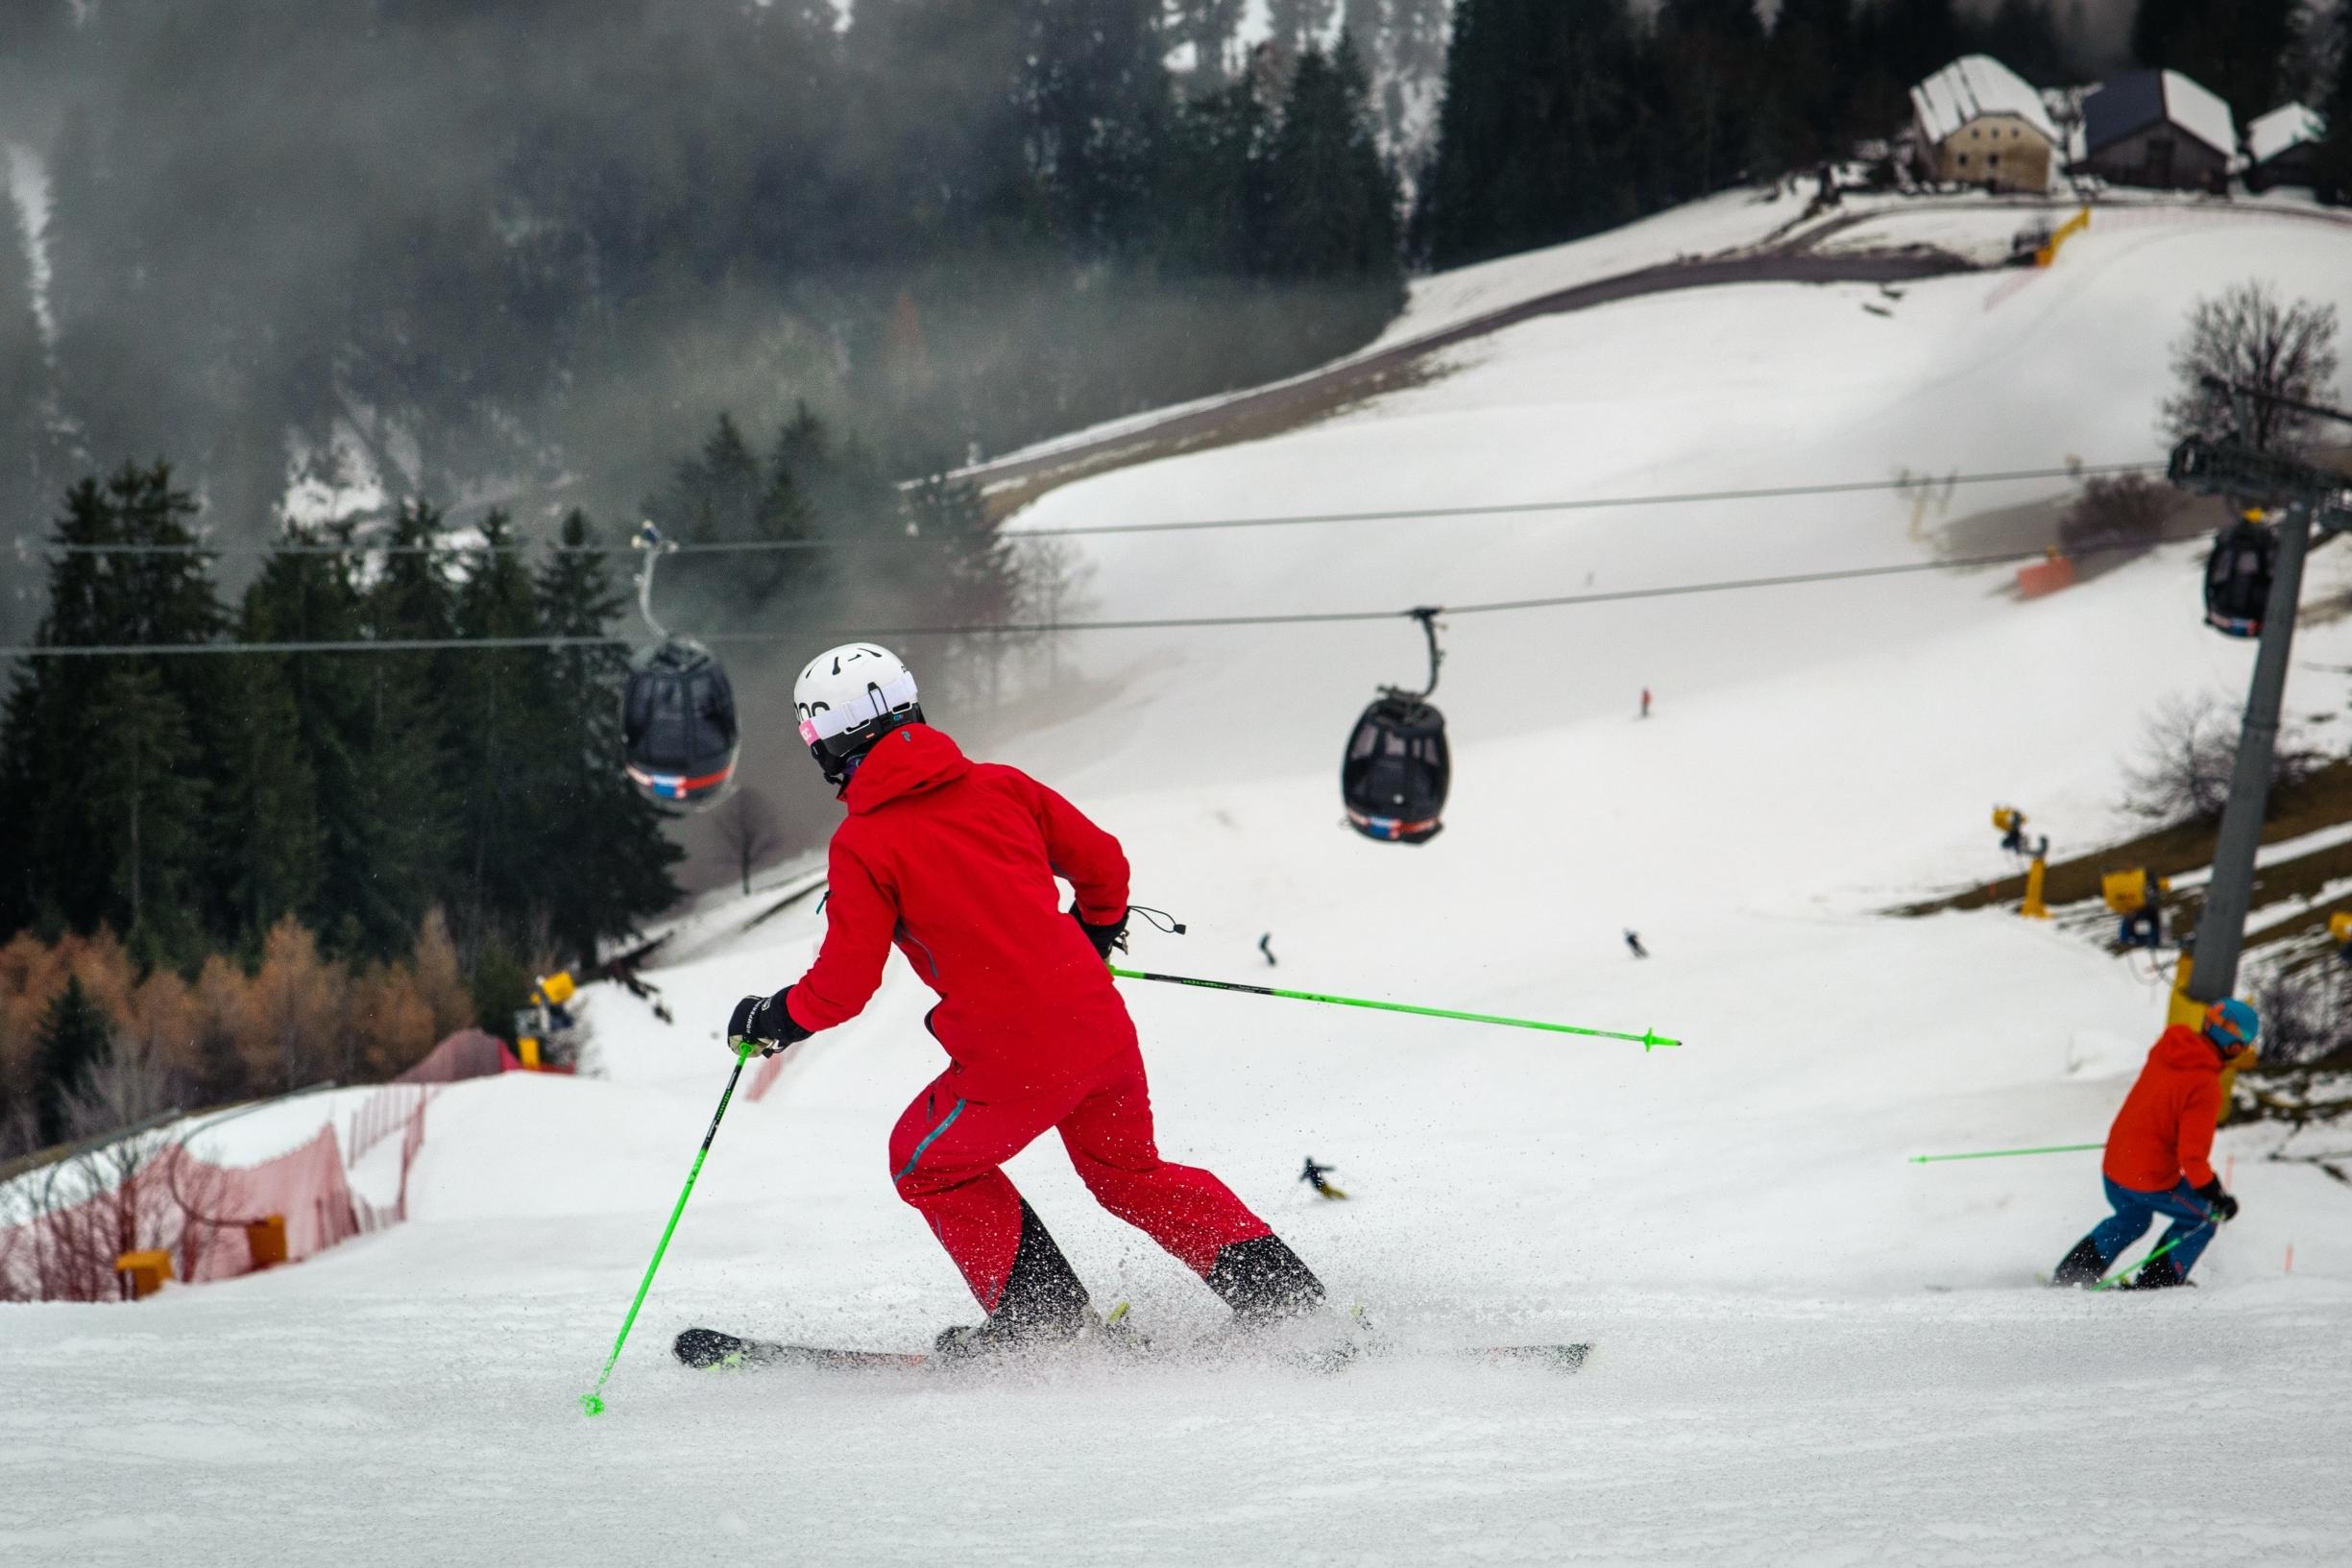 kronplatz_ski_patrola36-221219